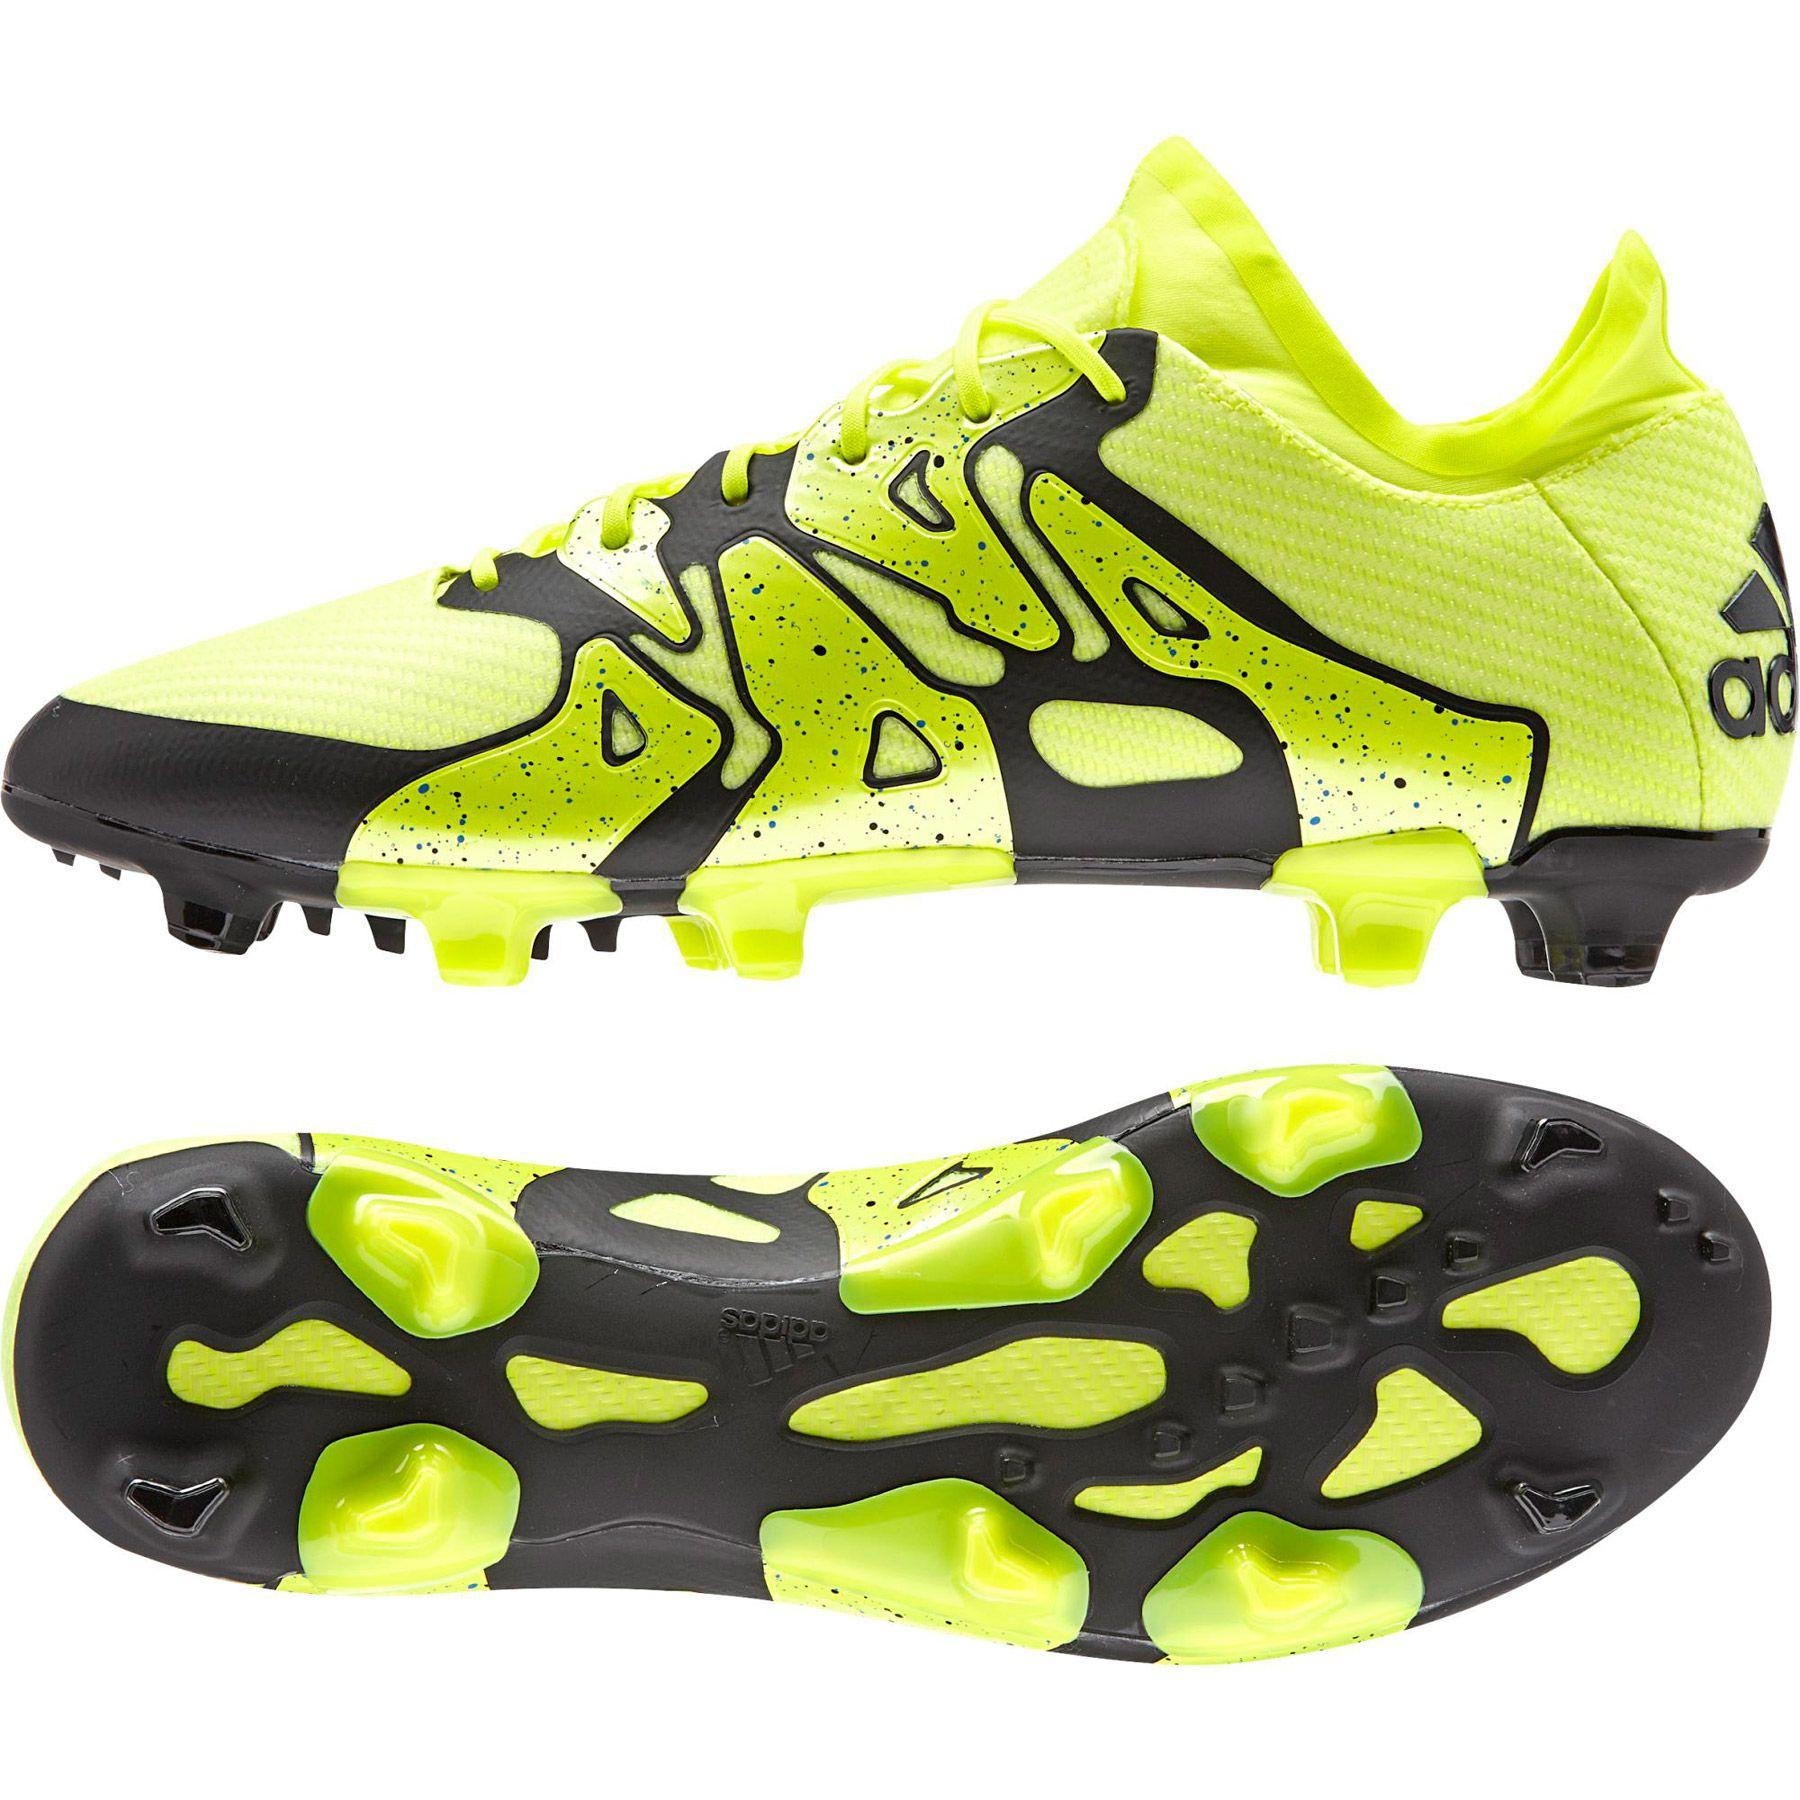 Adidas X 15.1 Firm Ground Football